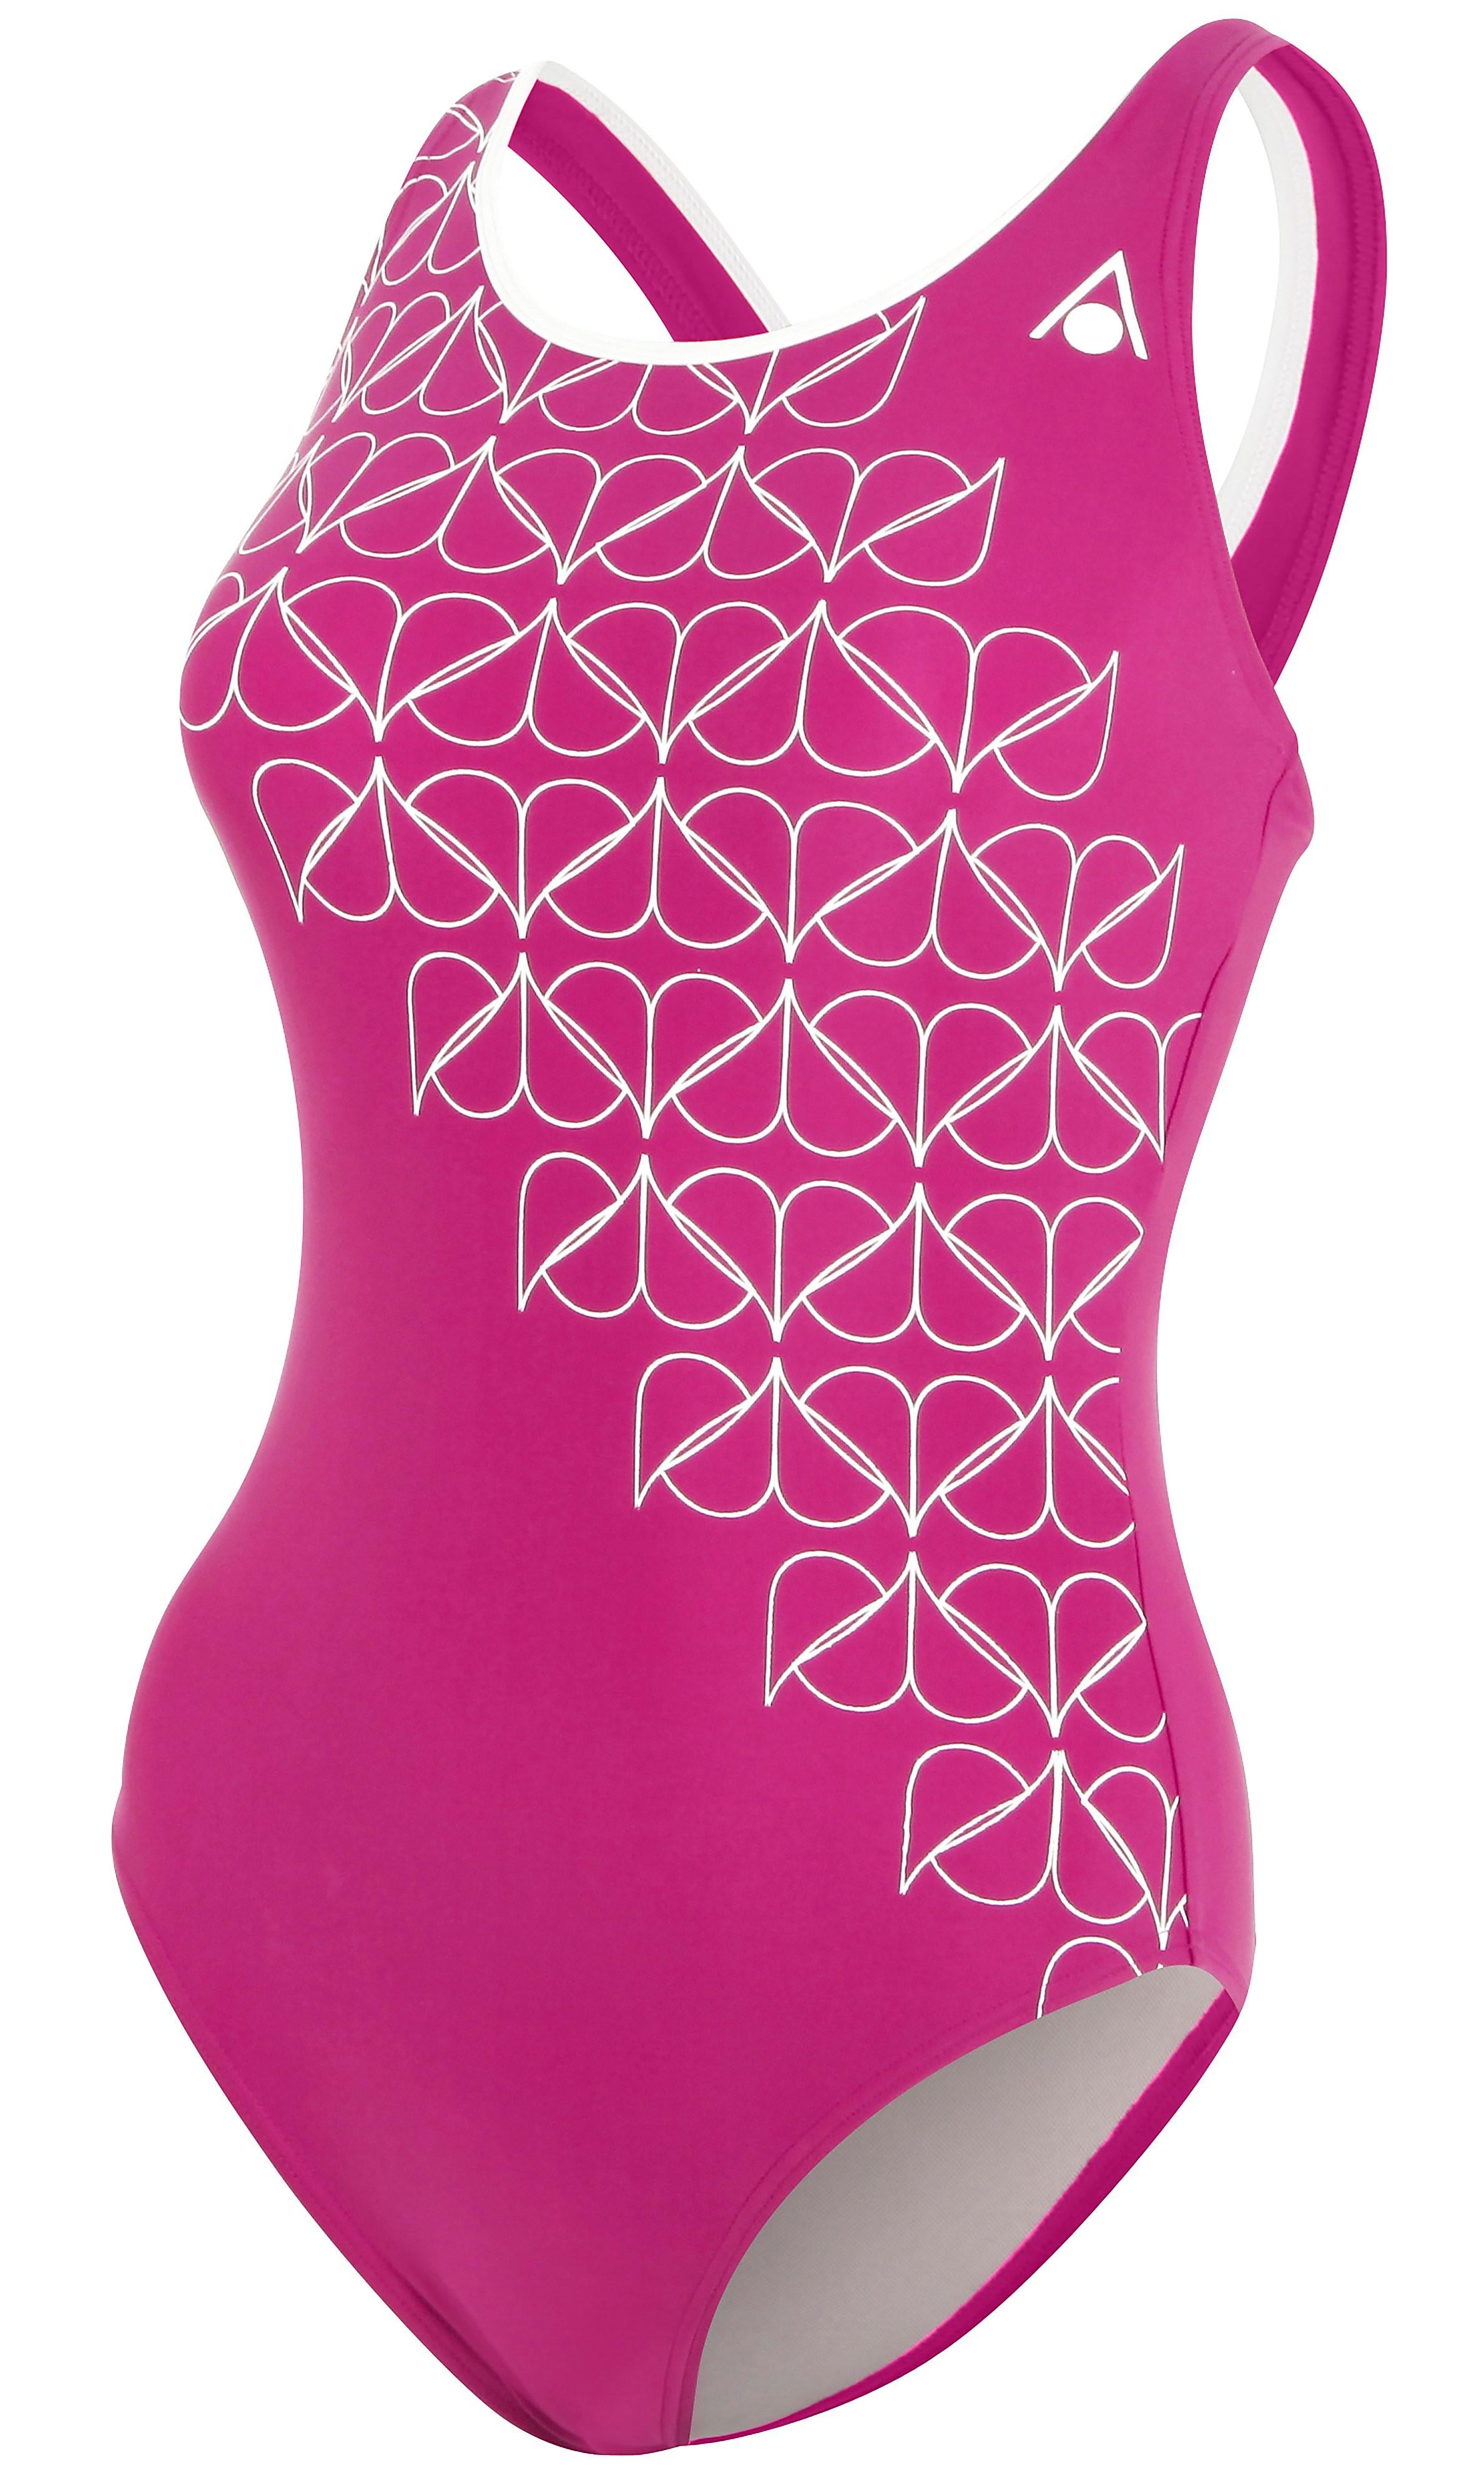 Aqua Sphere Molly Girl's Swimsuit